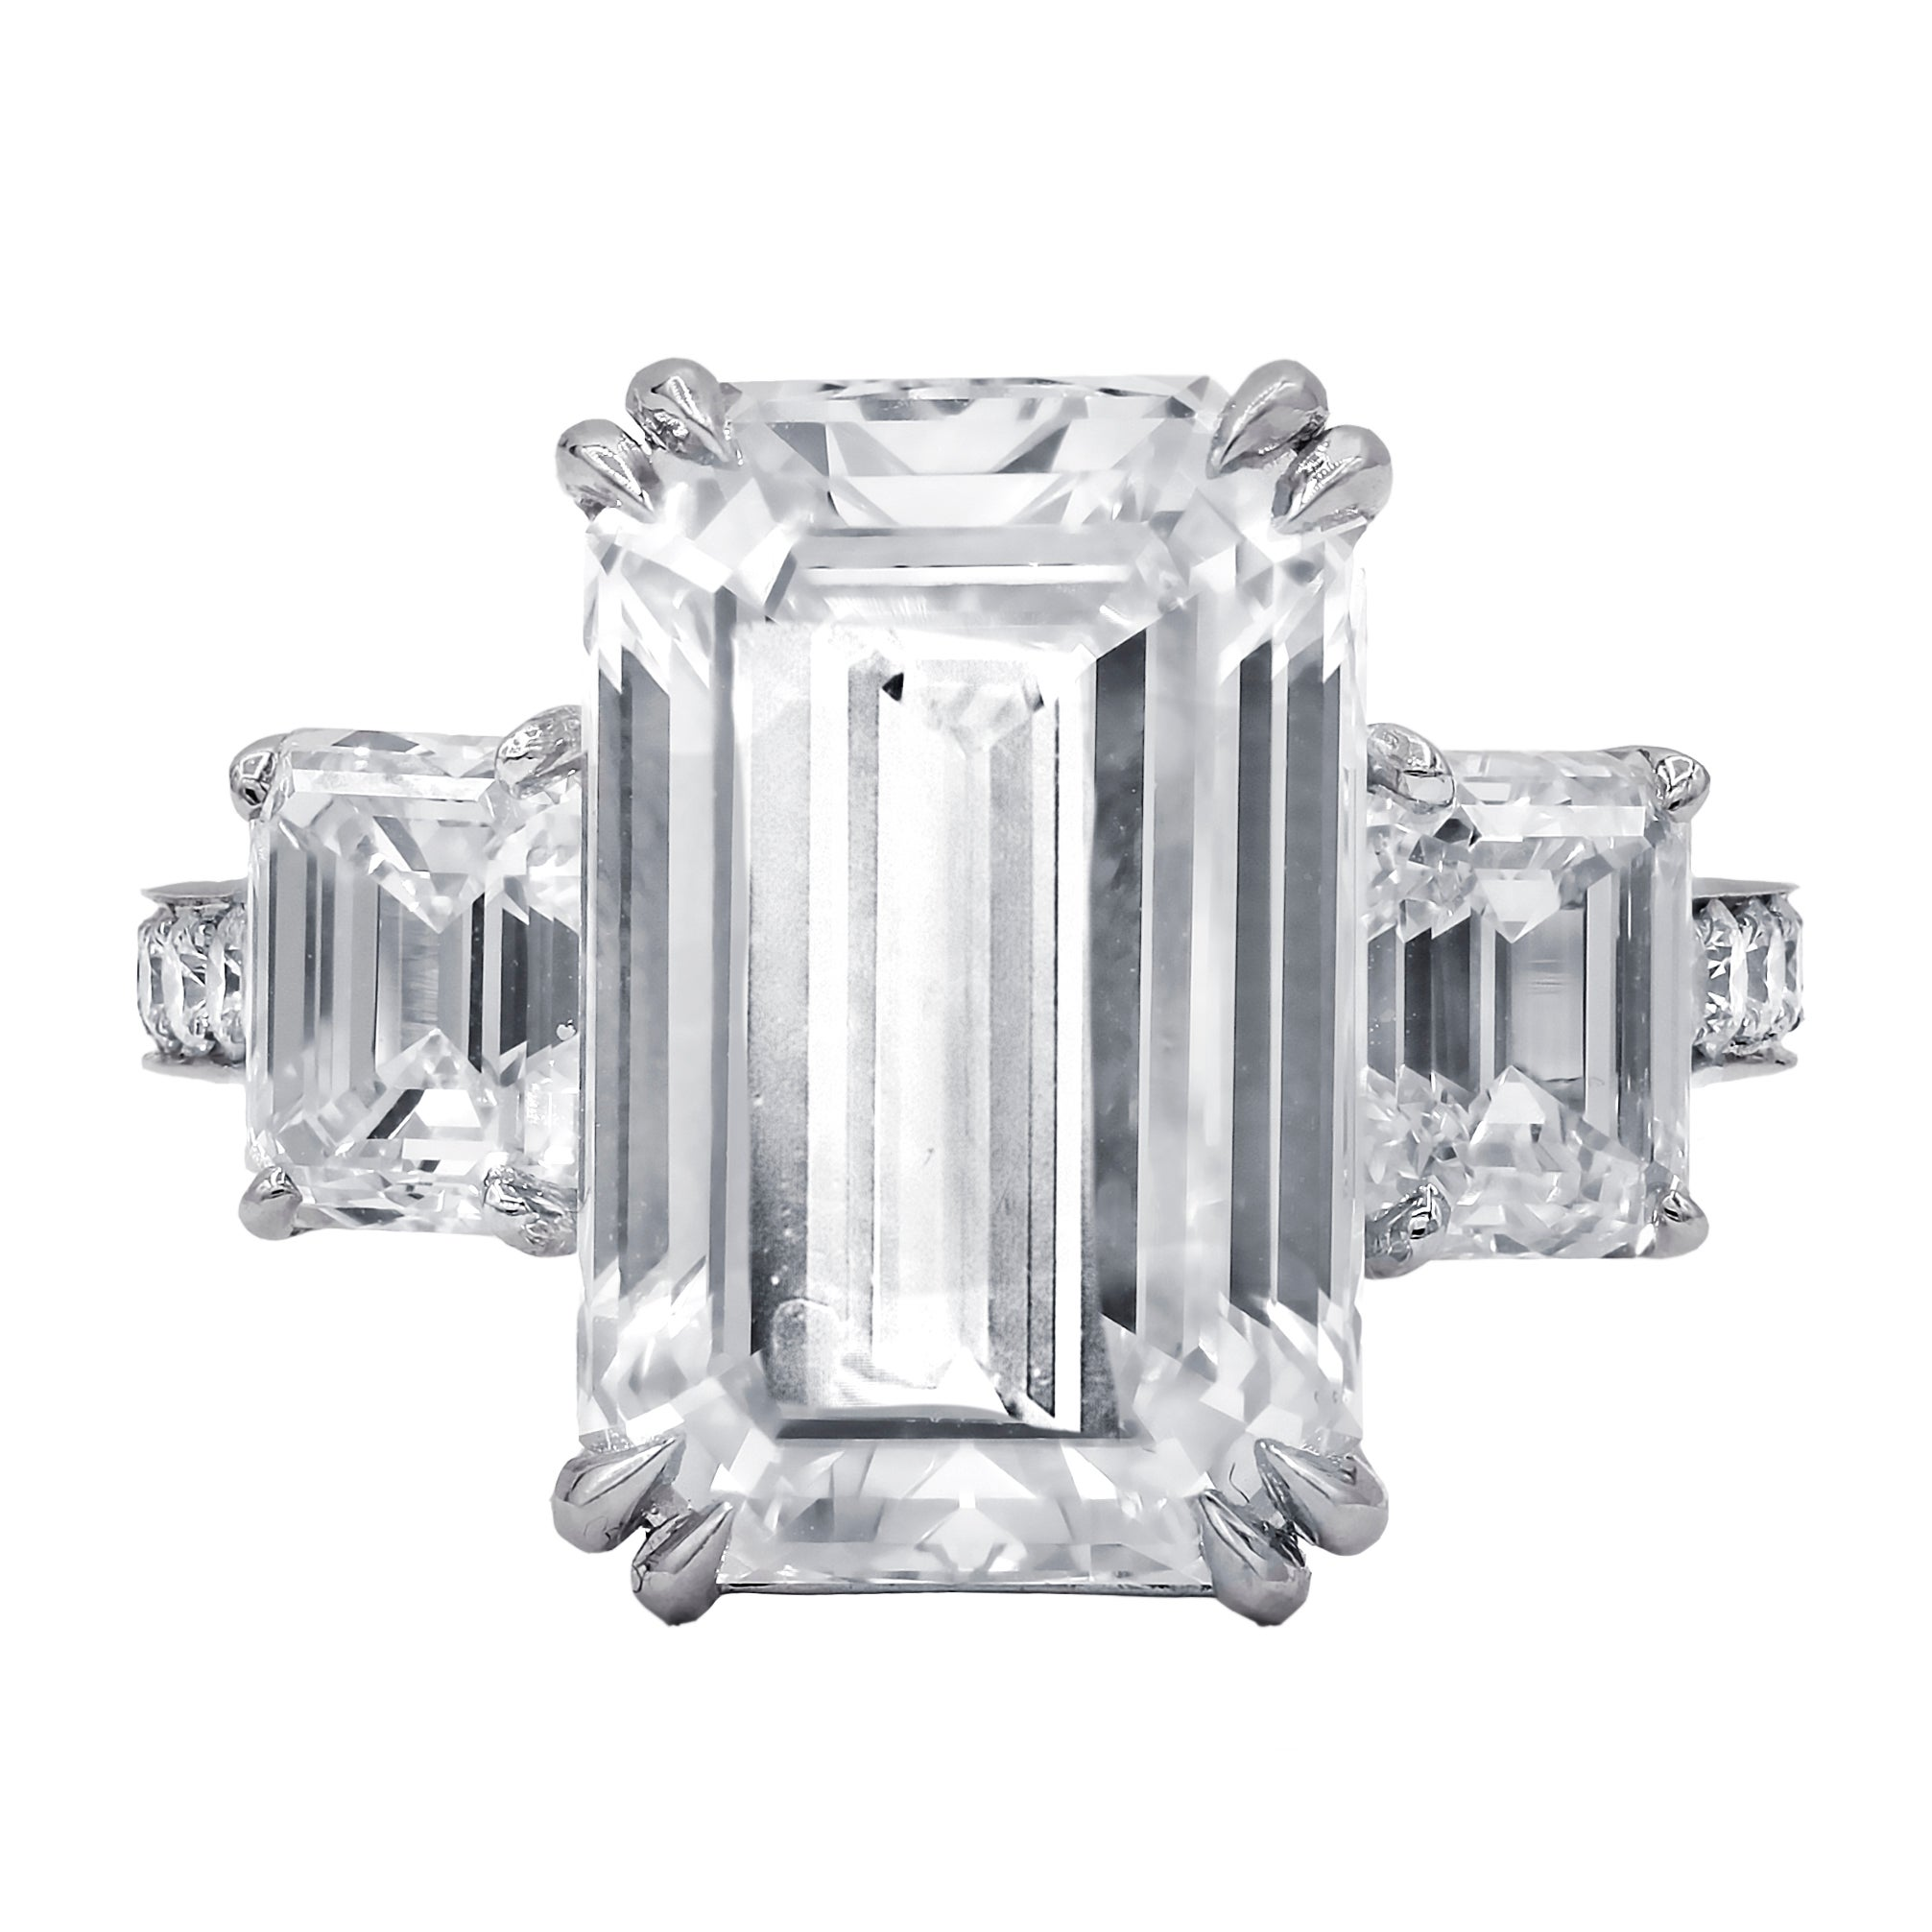 GIA Certified 9.38 Carat Emerald Cut Diamond Ring